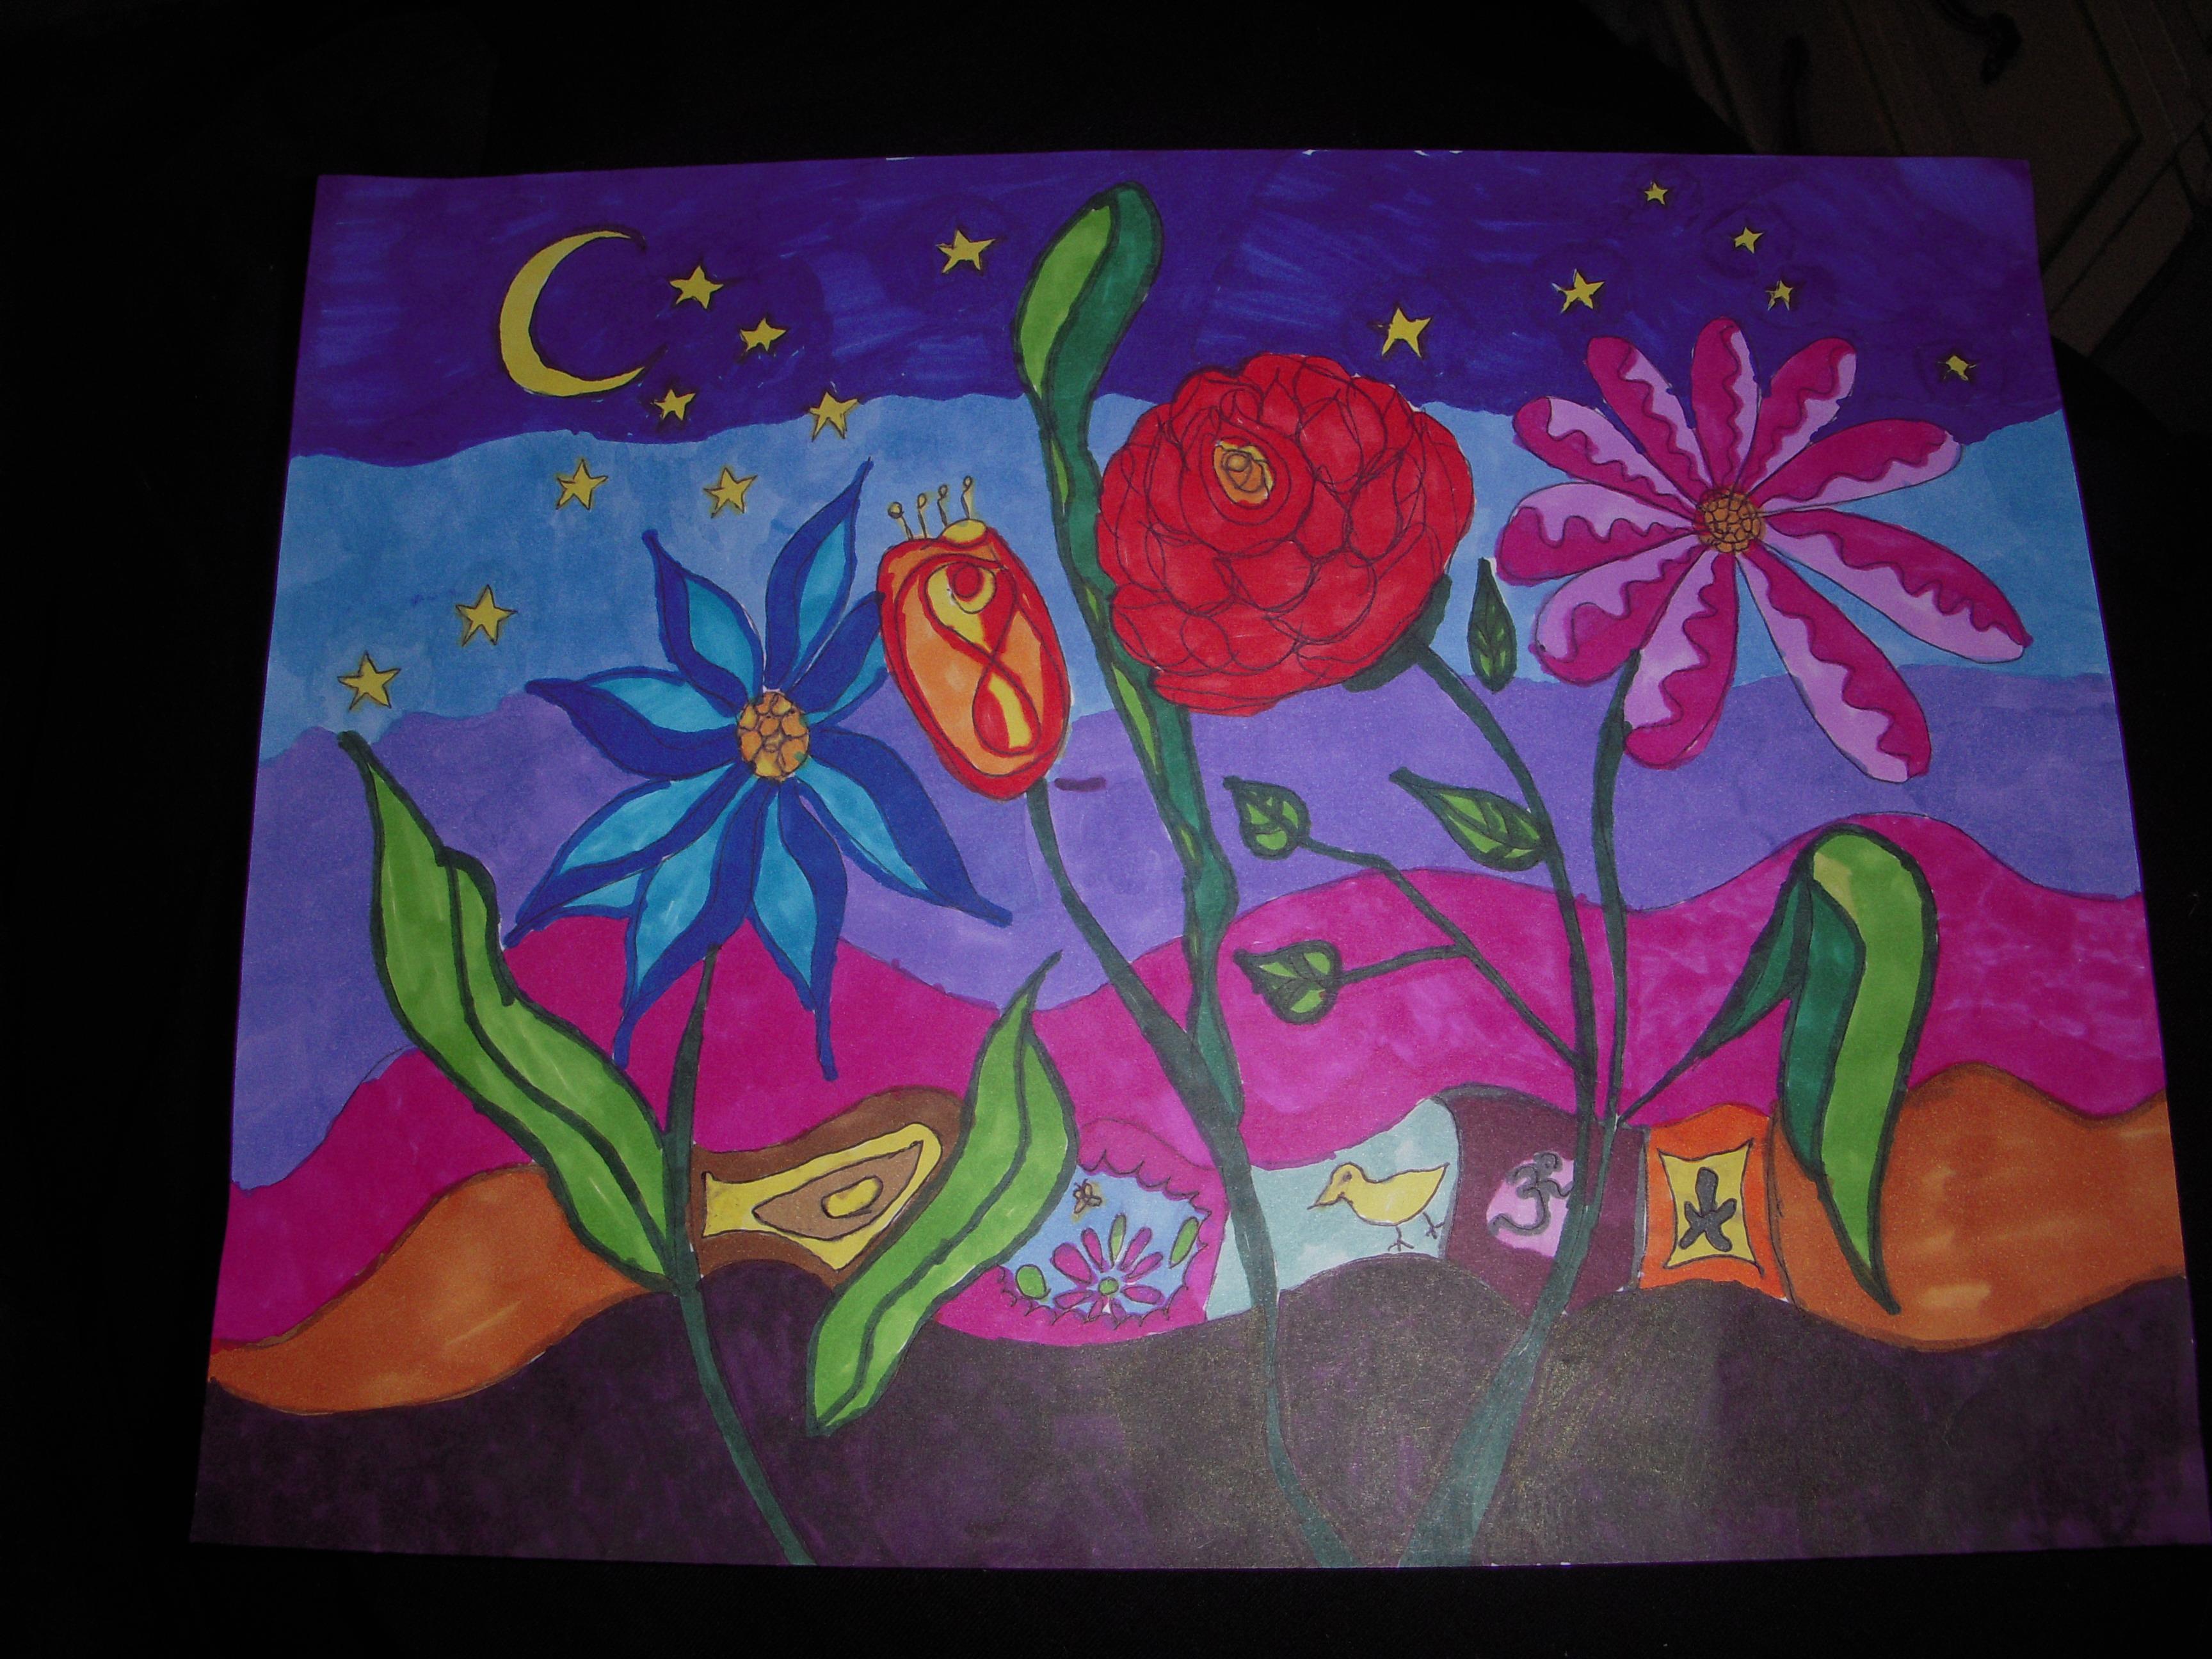 Anne Eunice artwork